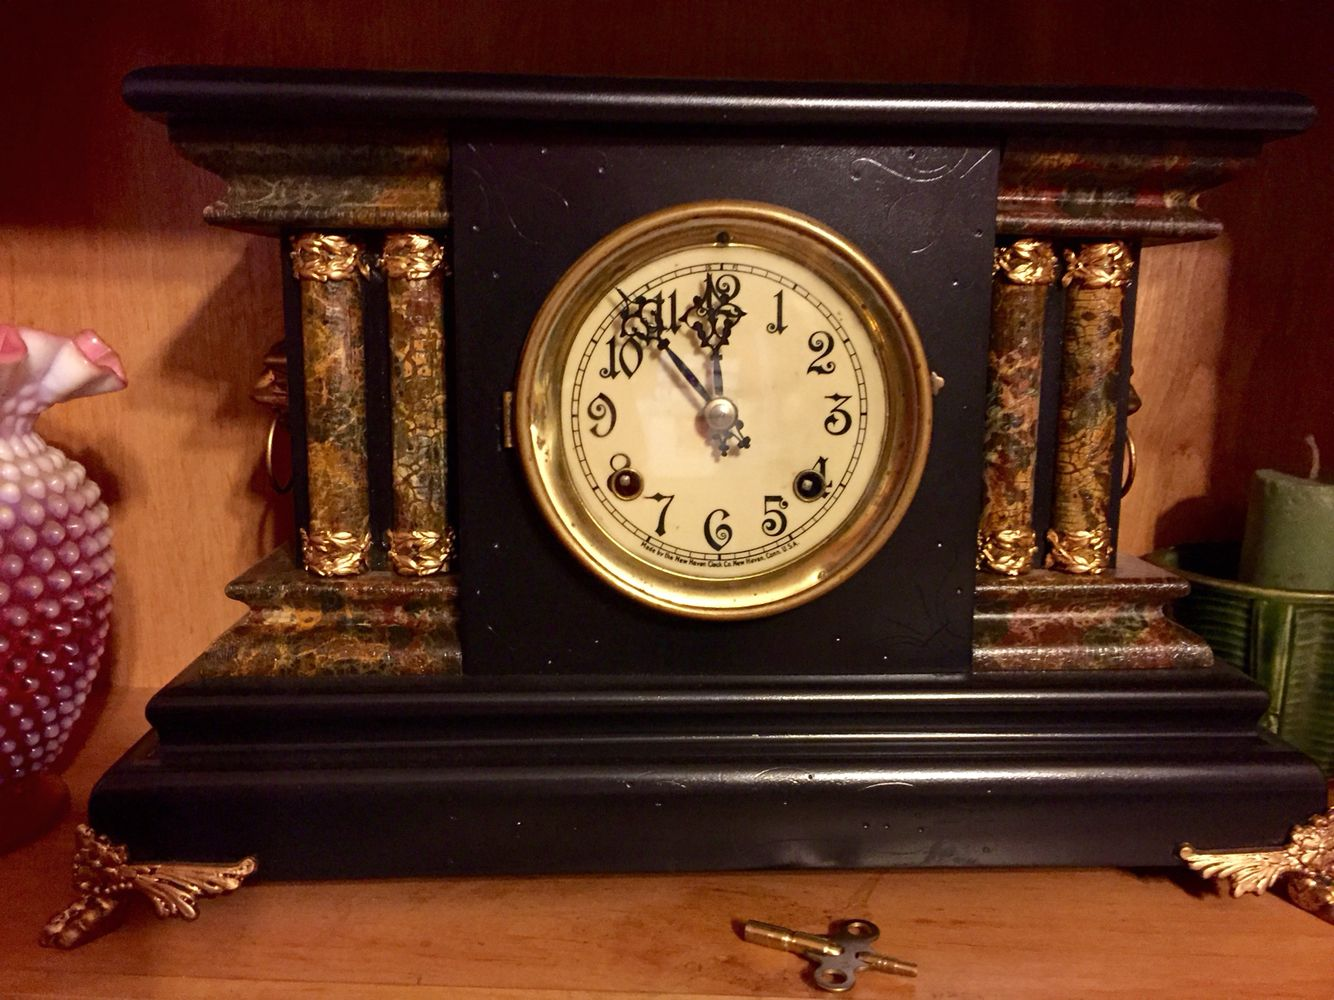 Brookwood By Kassel 31 Day Wood Wall Clock Vintage Wall Clock Pendulum Clock Chiming Wall Clocks